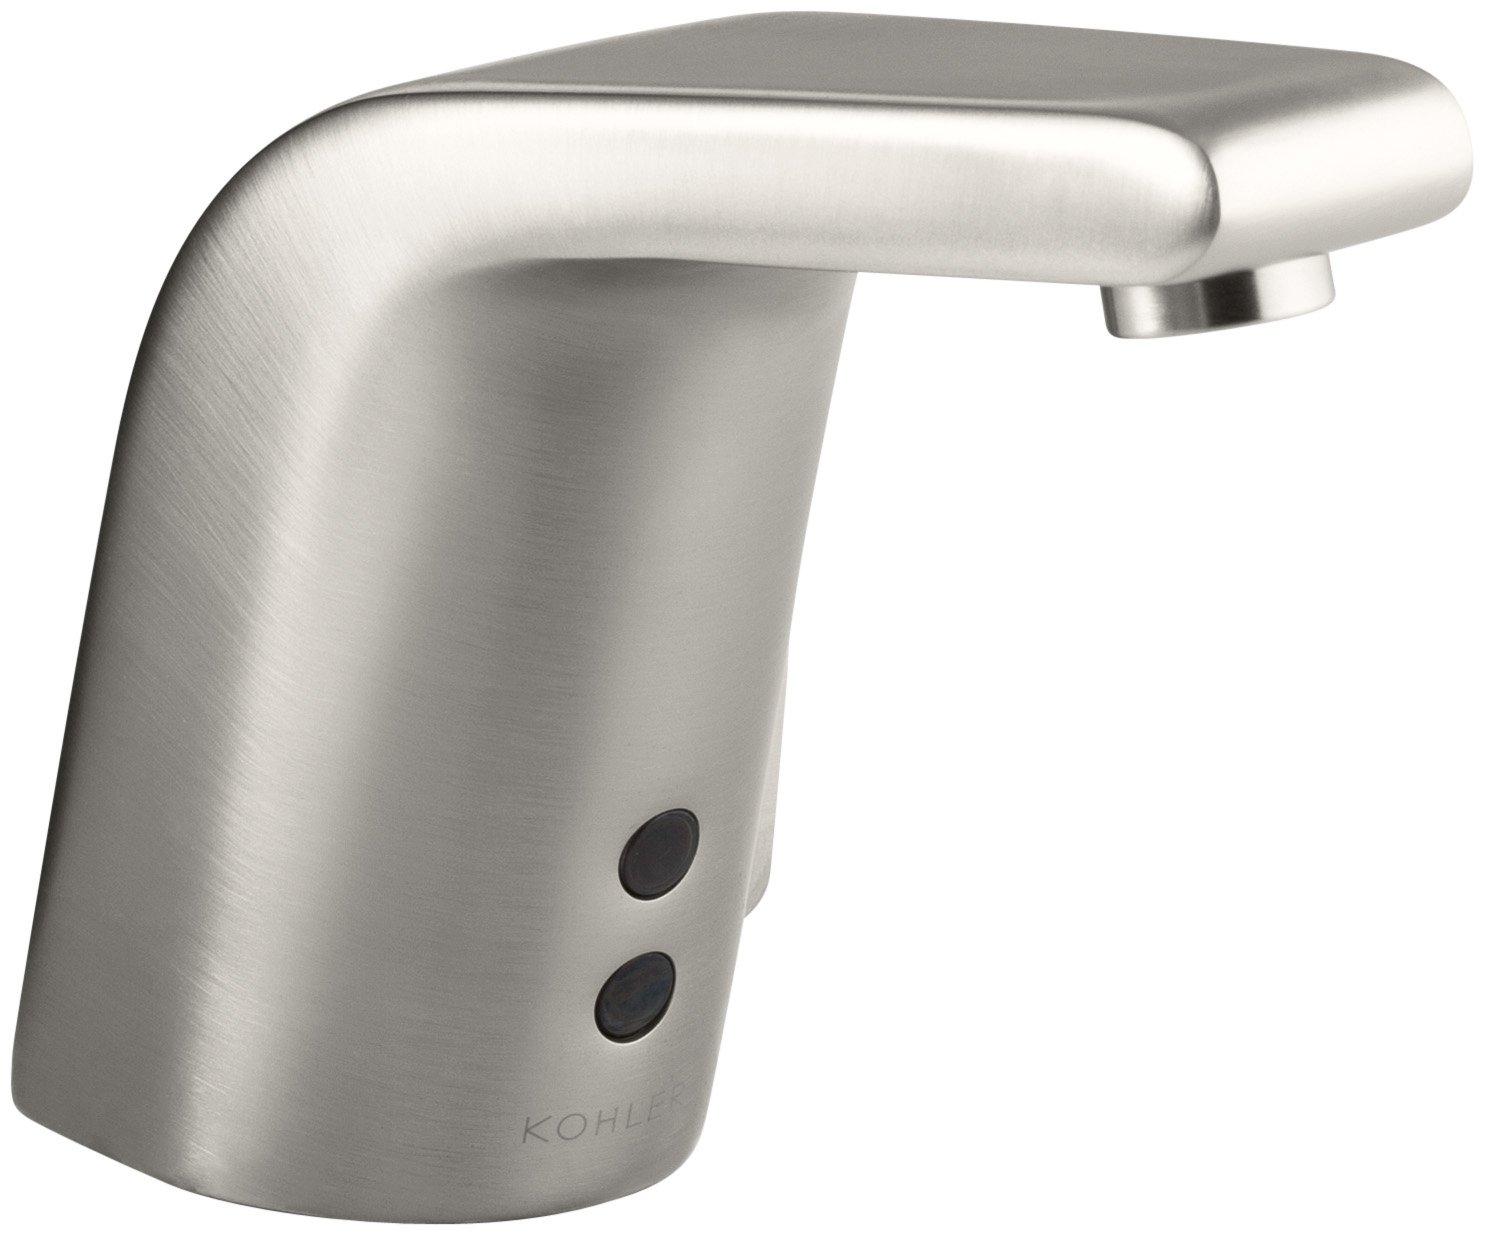 KOHLER K-13462-VS Sculpted Touchless Ac-Powered Deck-Mount Faucet ...